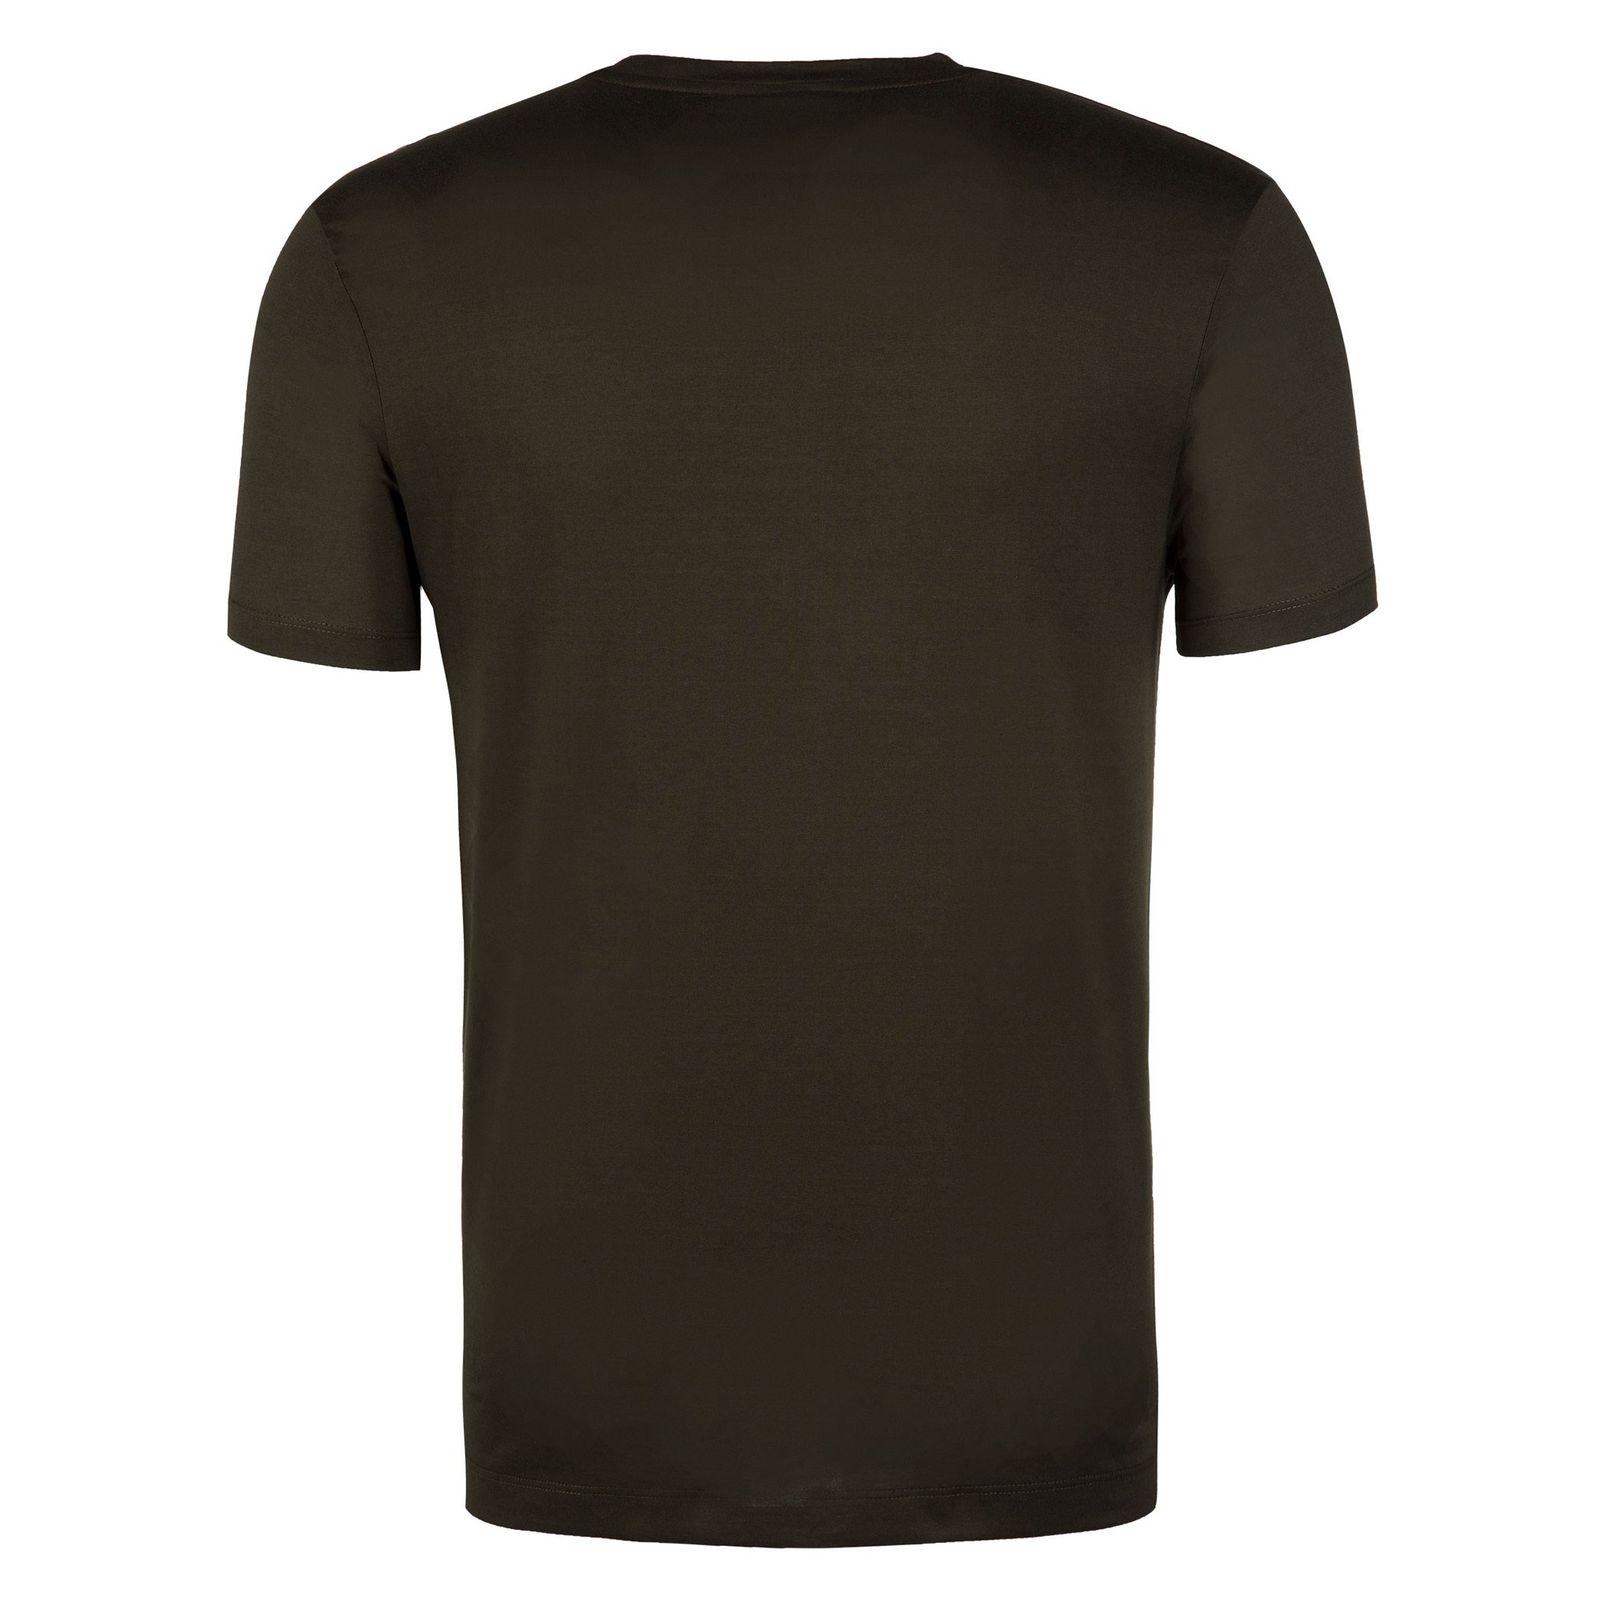 تی شرت نخی یقه گرد مردانه - پاول اند شارک - زيتوني تيره - 2